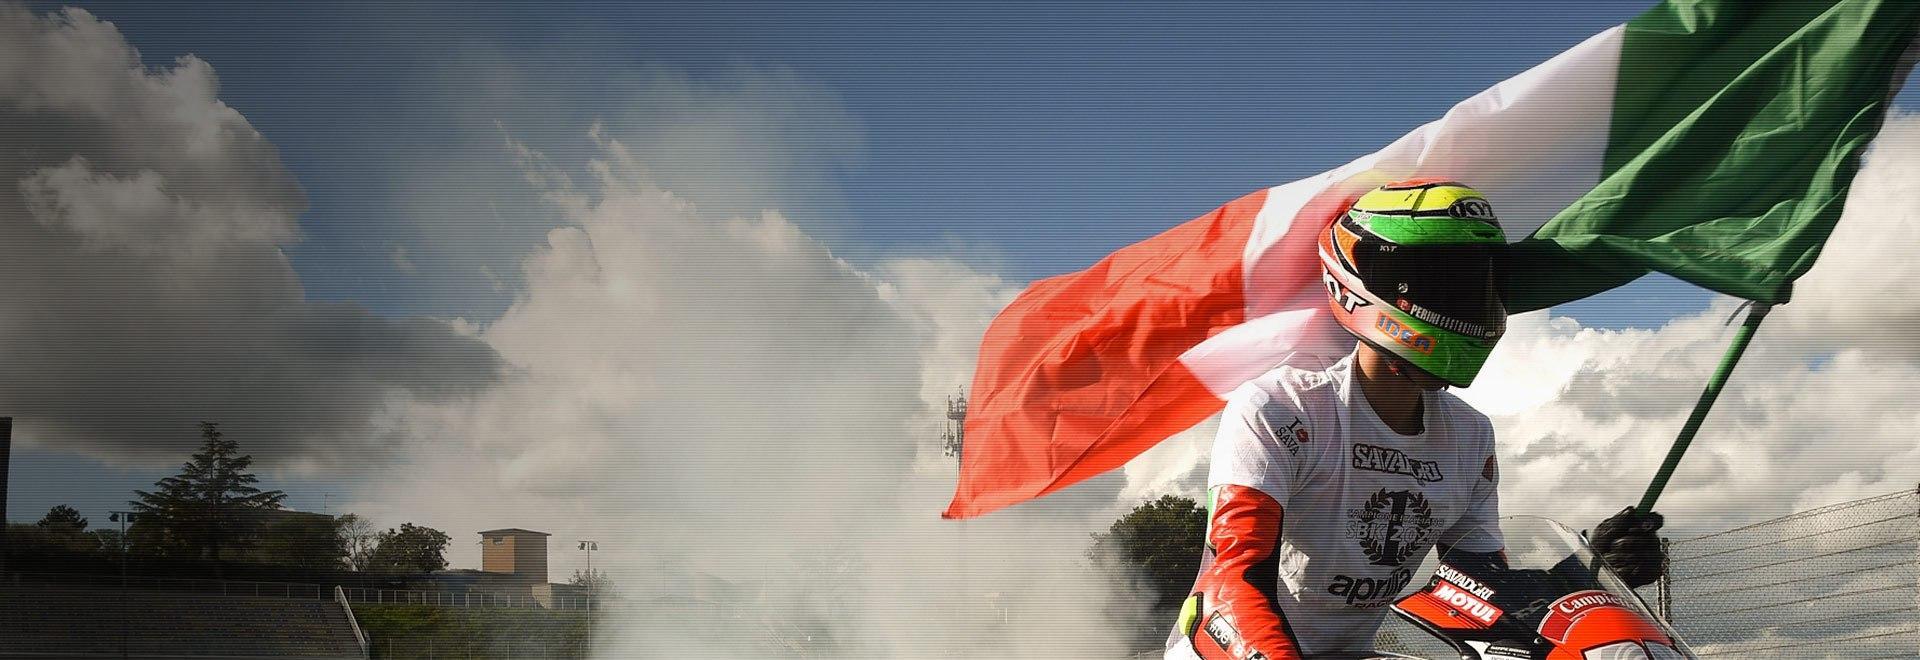 GP Mugello: Moto3. Race 2